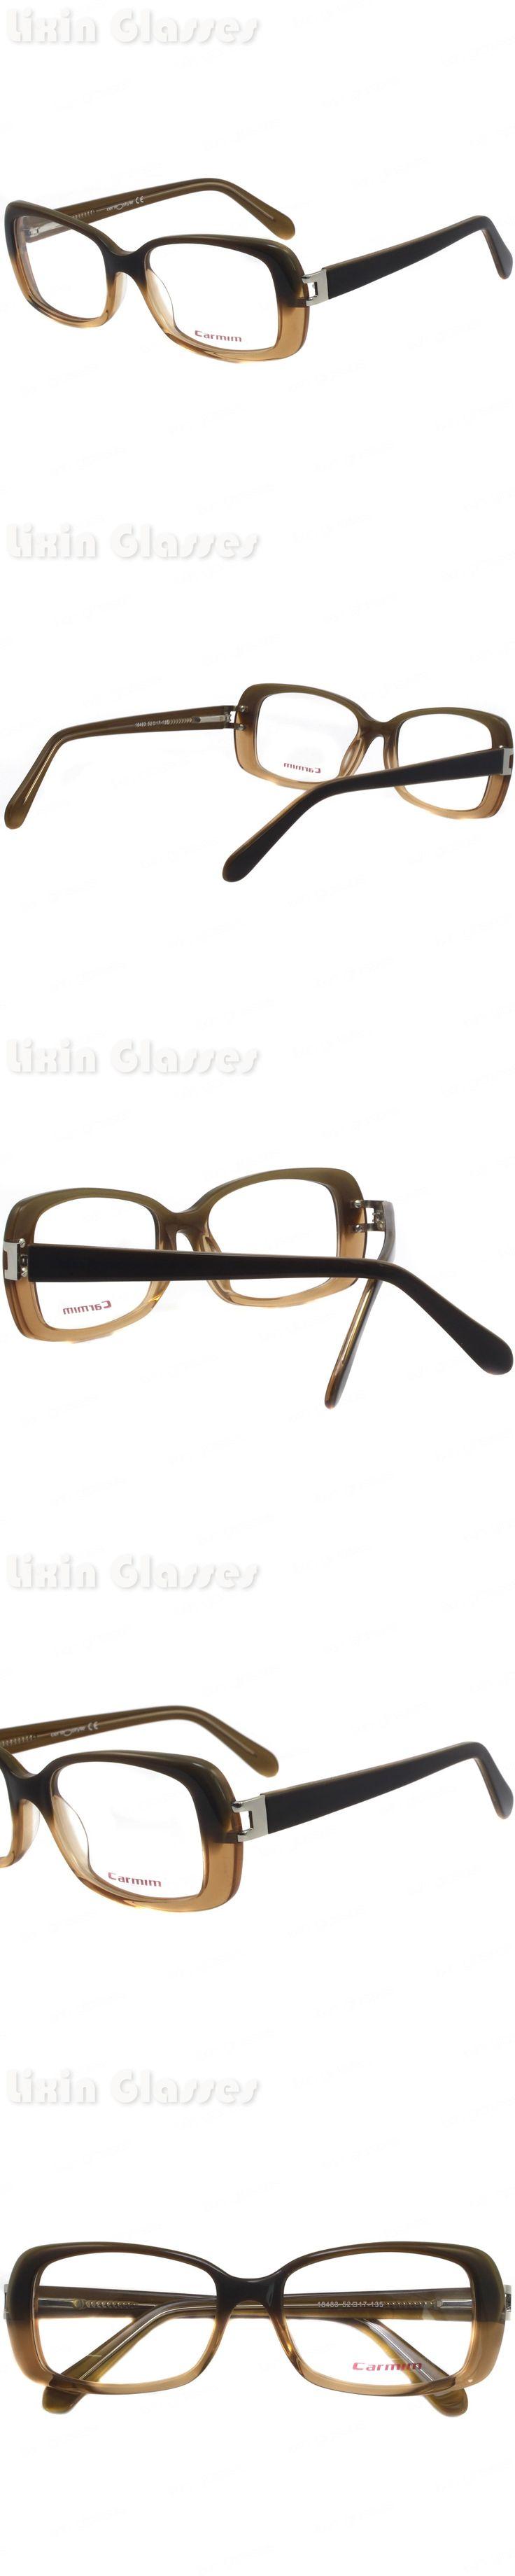 High Quality Lady Hand Made Frame Gradient Brown Italy Design Prescription Glasses Frame/ Eyeglasses/ Optical Frames 18483